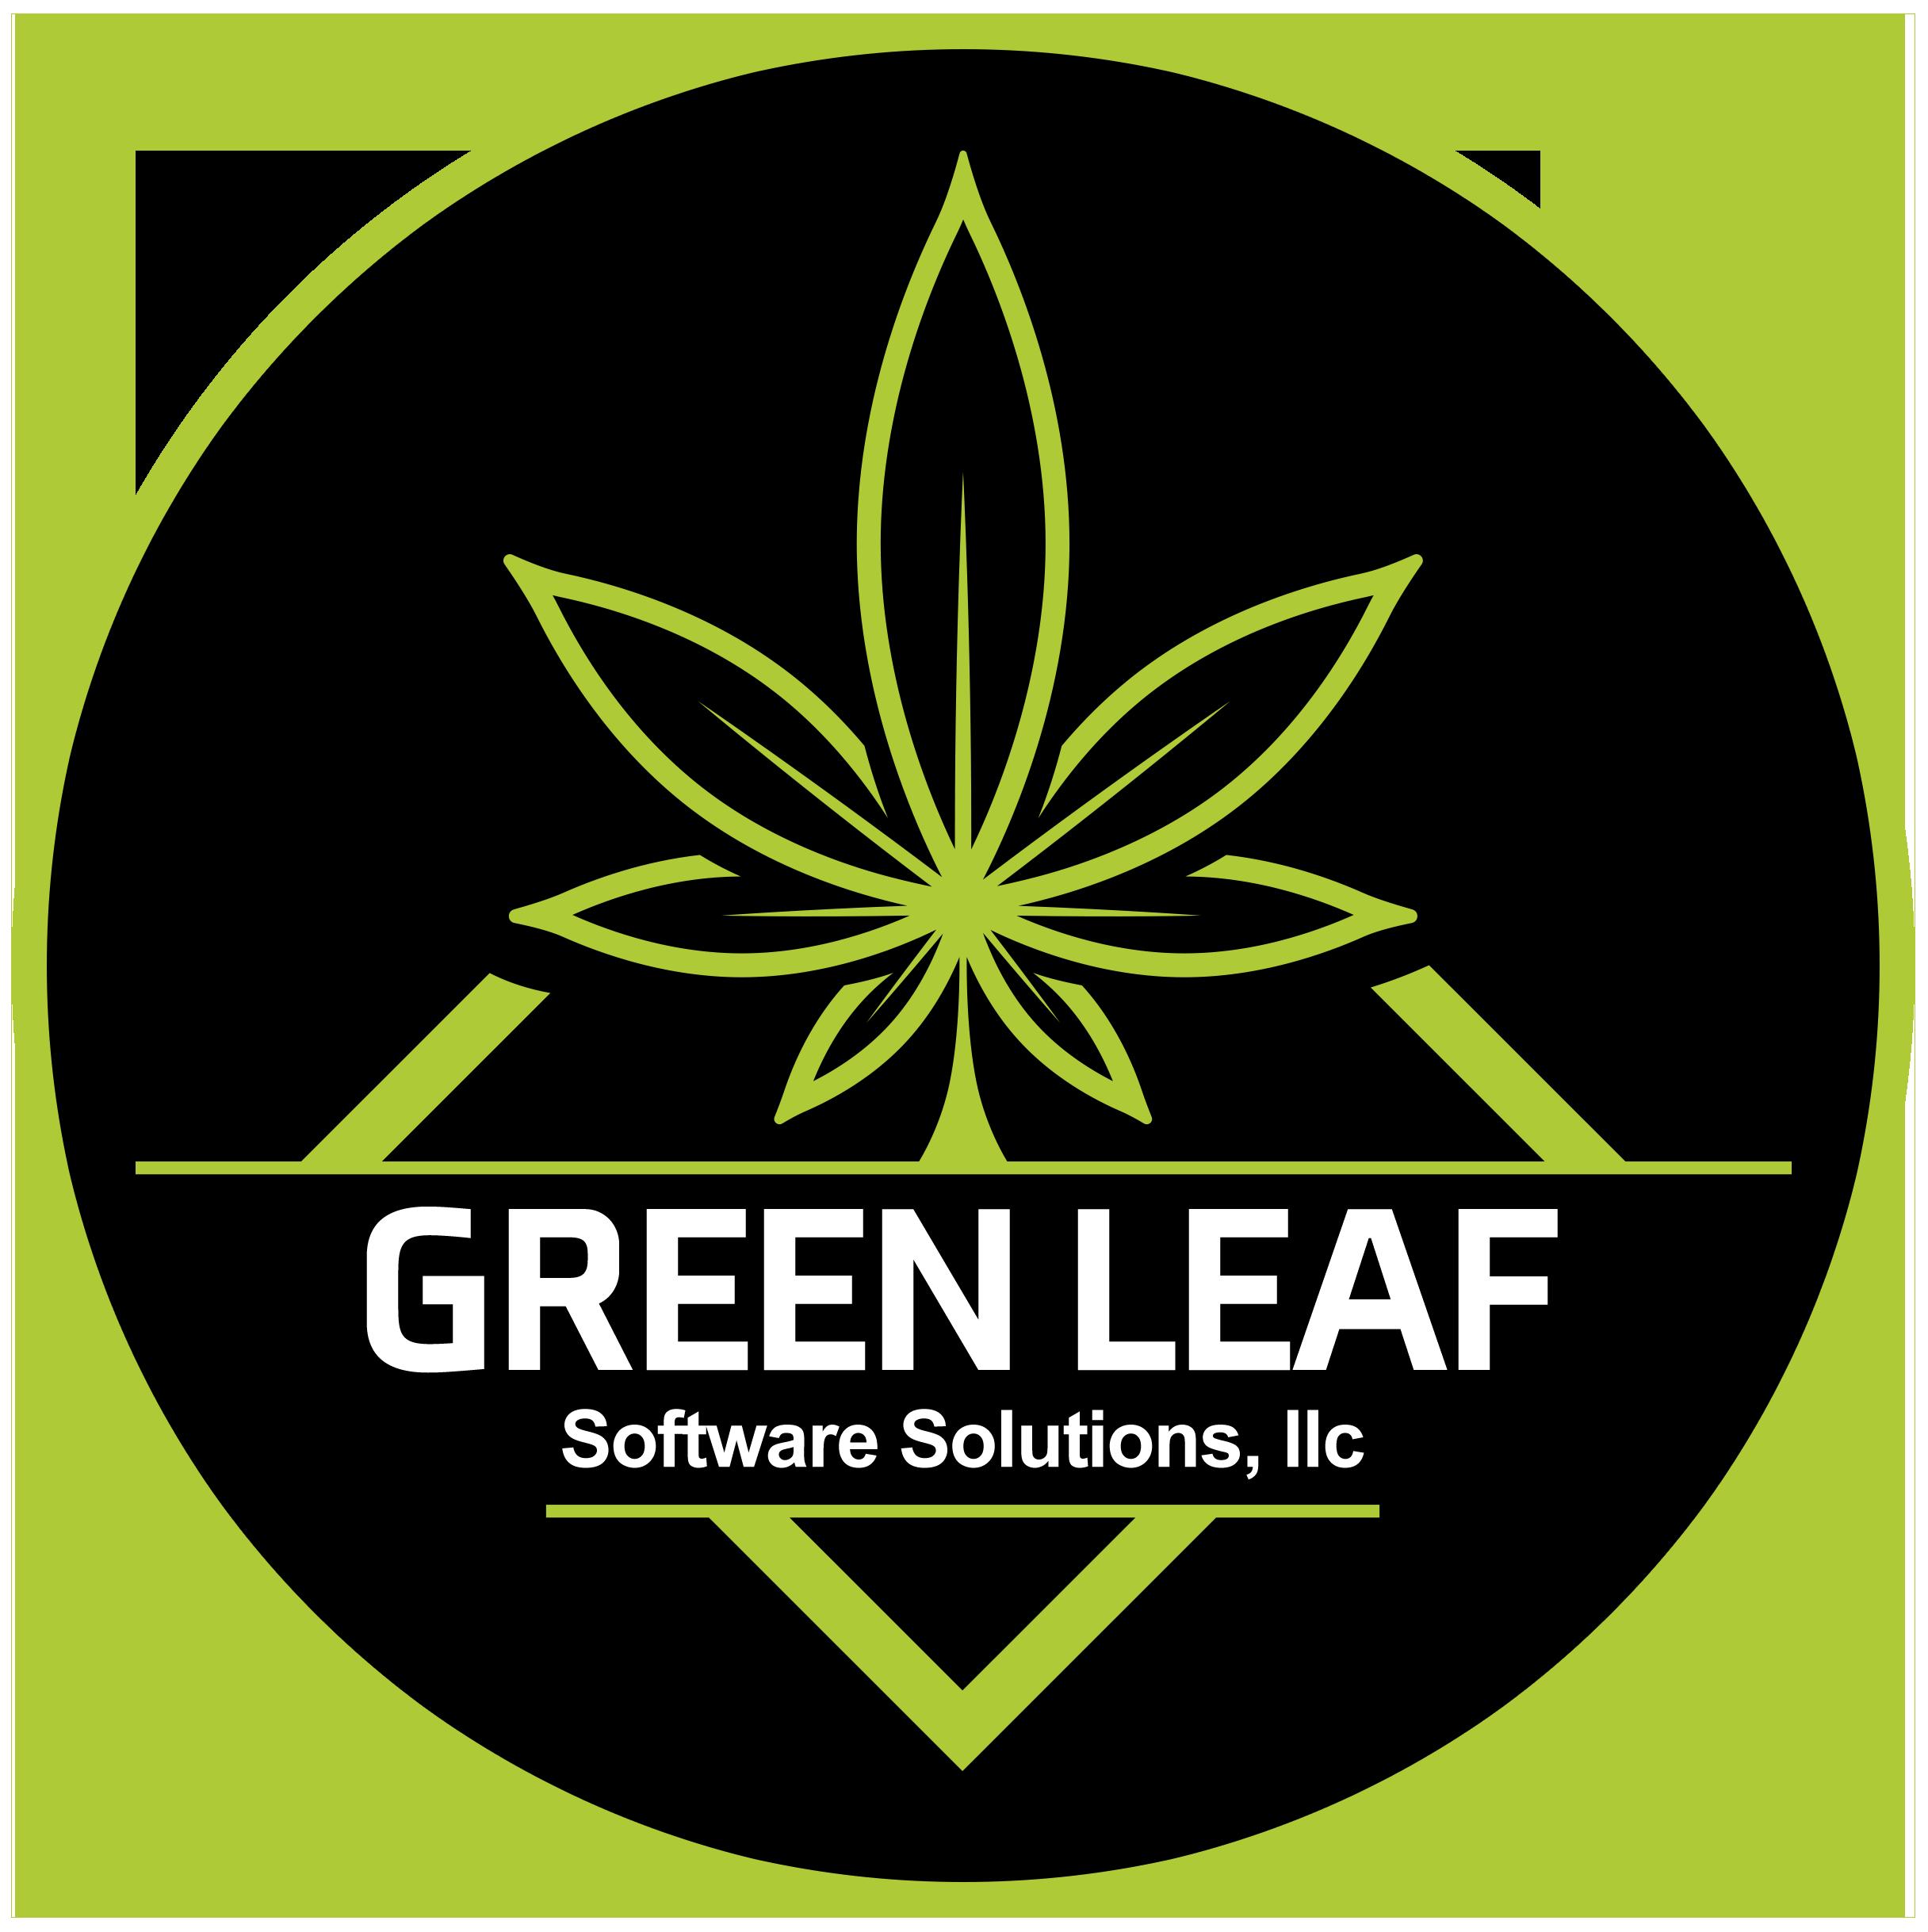 Green Leaf Software Solutions